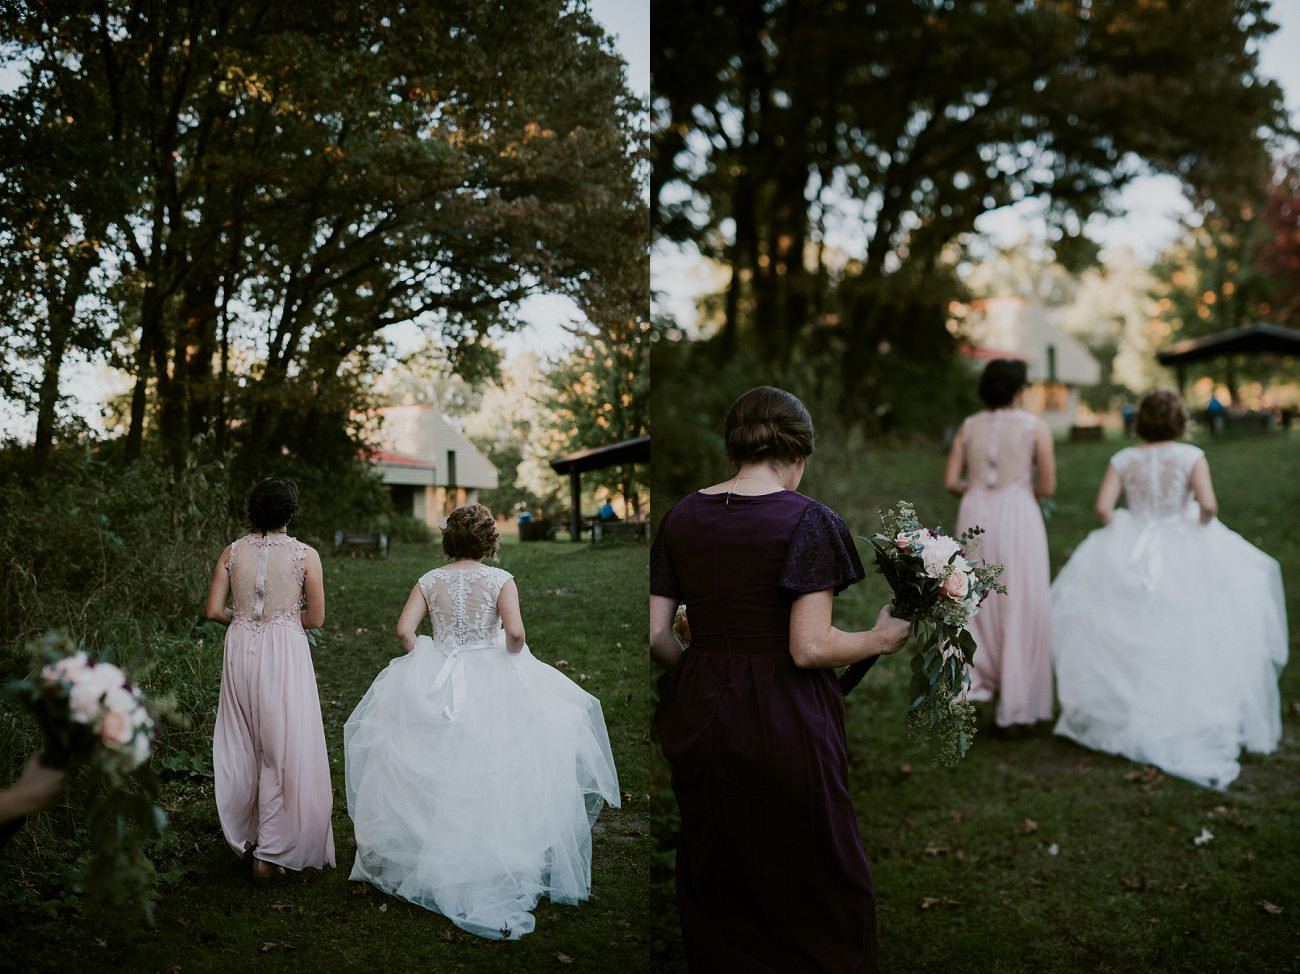 Minneapolis Elopement - Fall Elopement - Natural Intuition photography